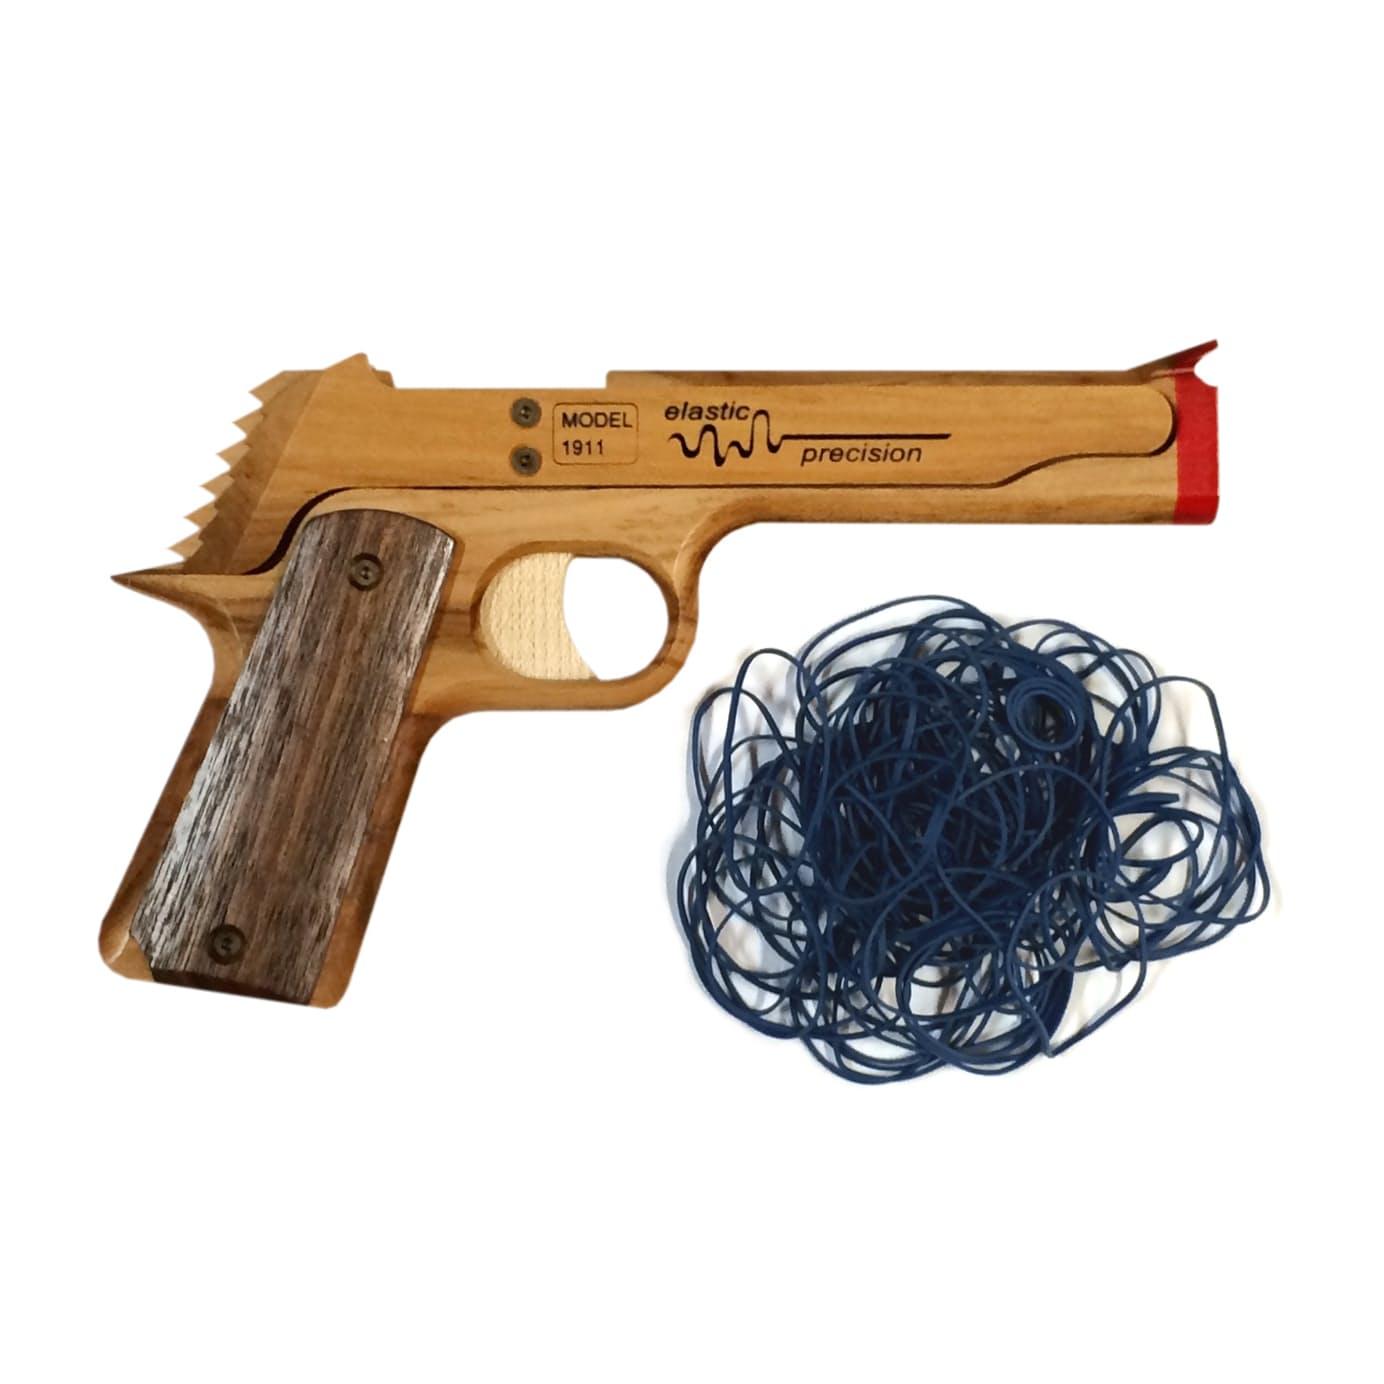 Bagugenrav elastic precision 1911 rubber band gun 0 original